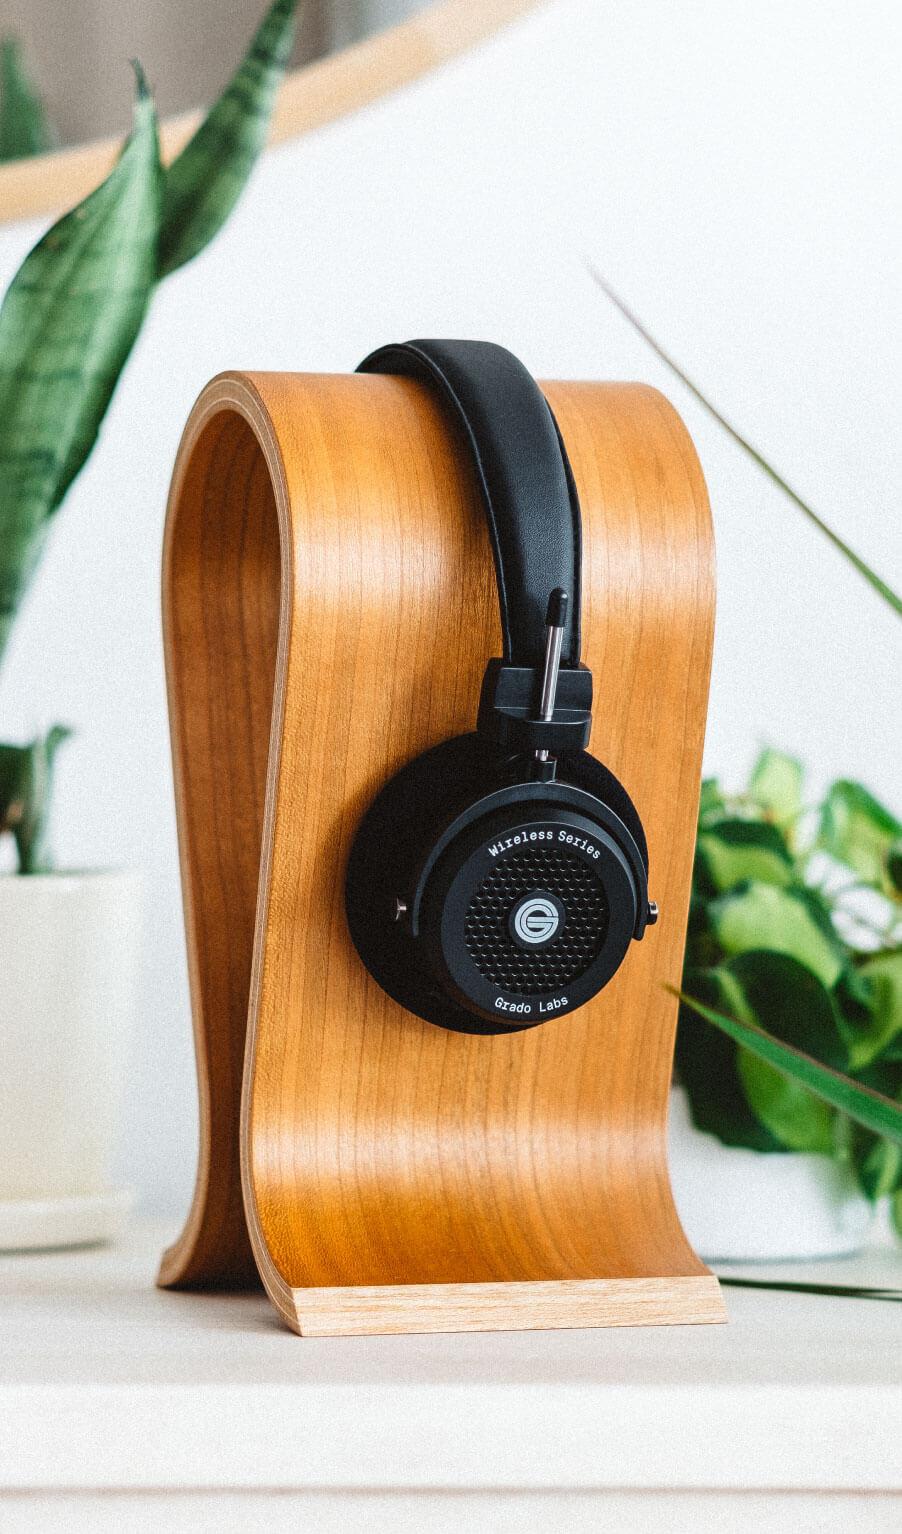 Wireless Series - Grado Labs